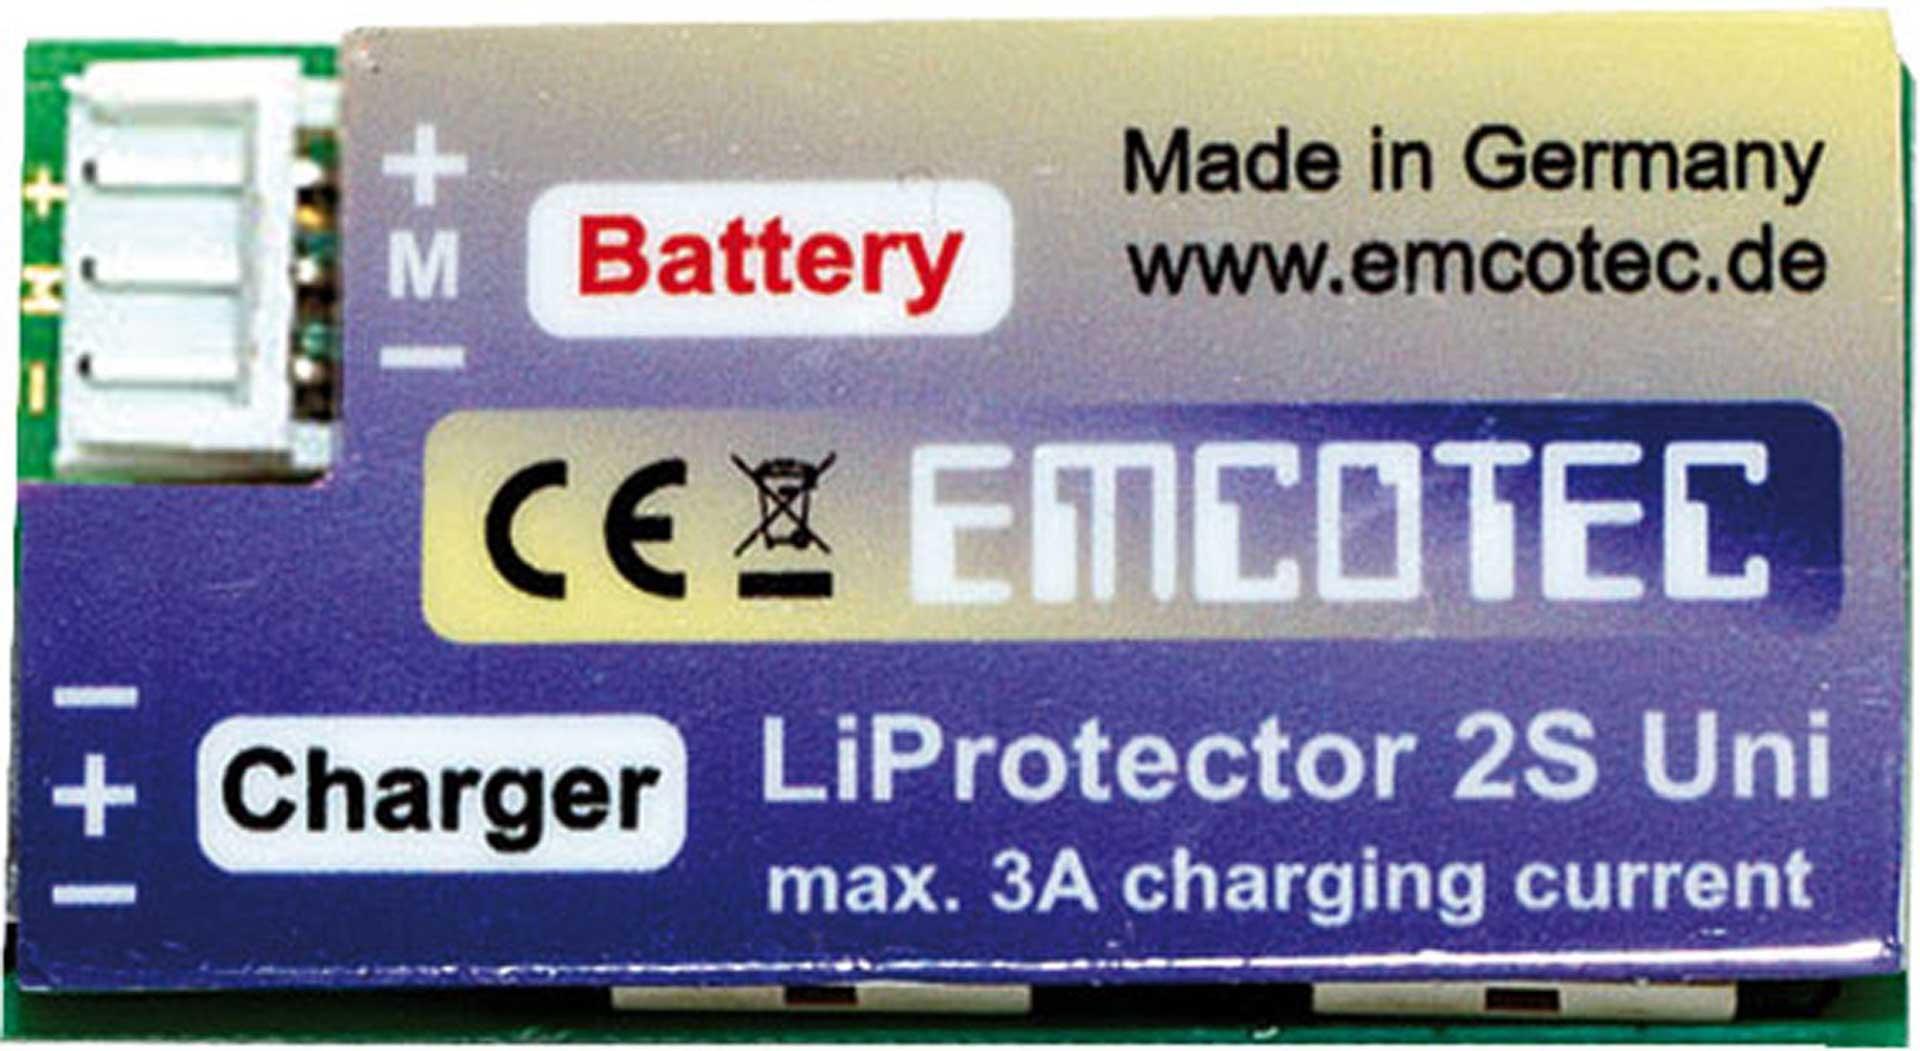 EMCOTEC LIPROTECTOR 2S UNI